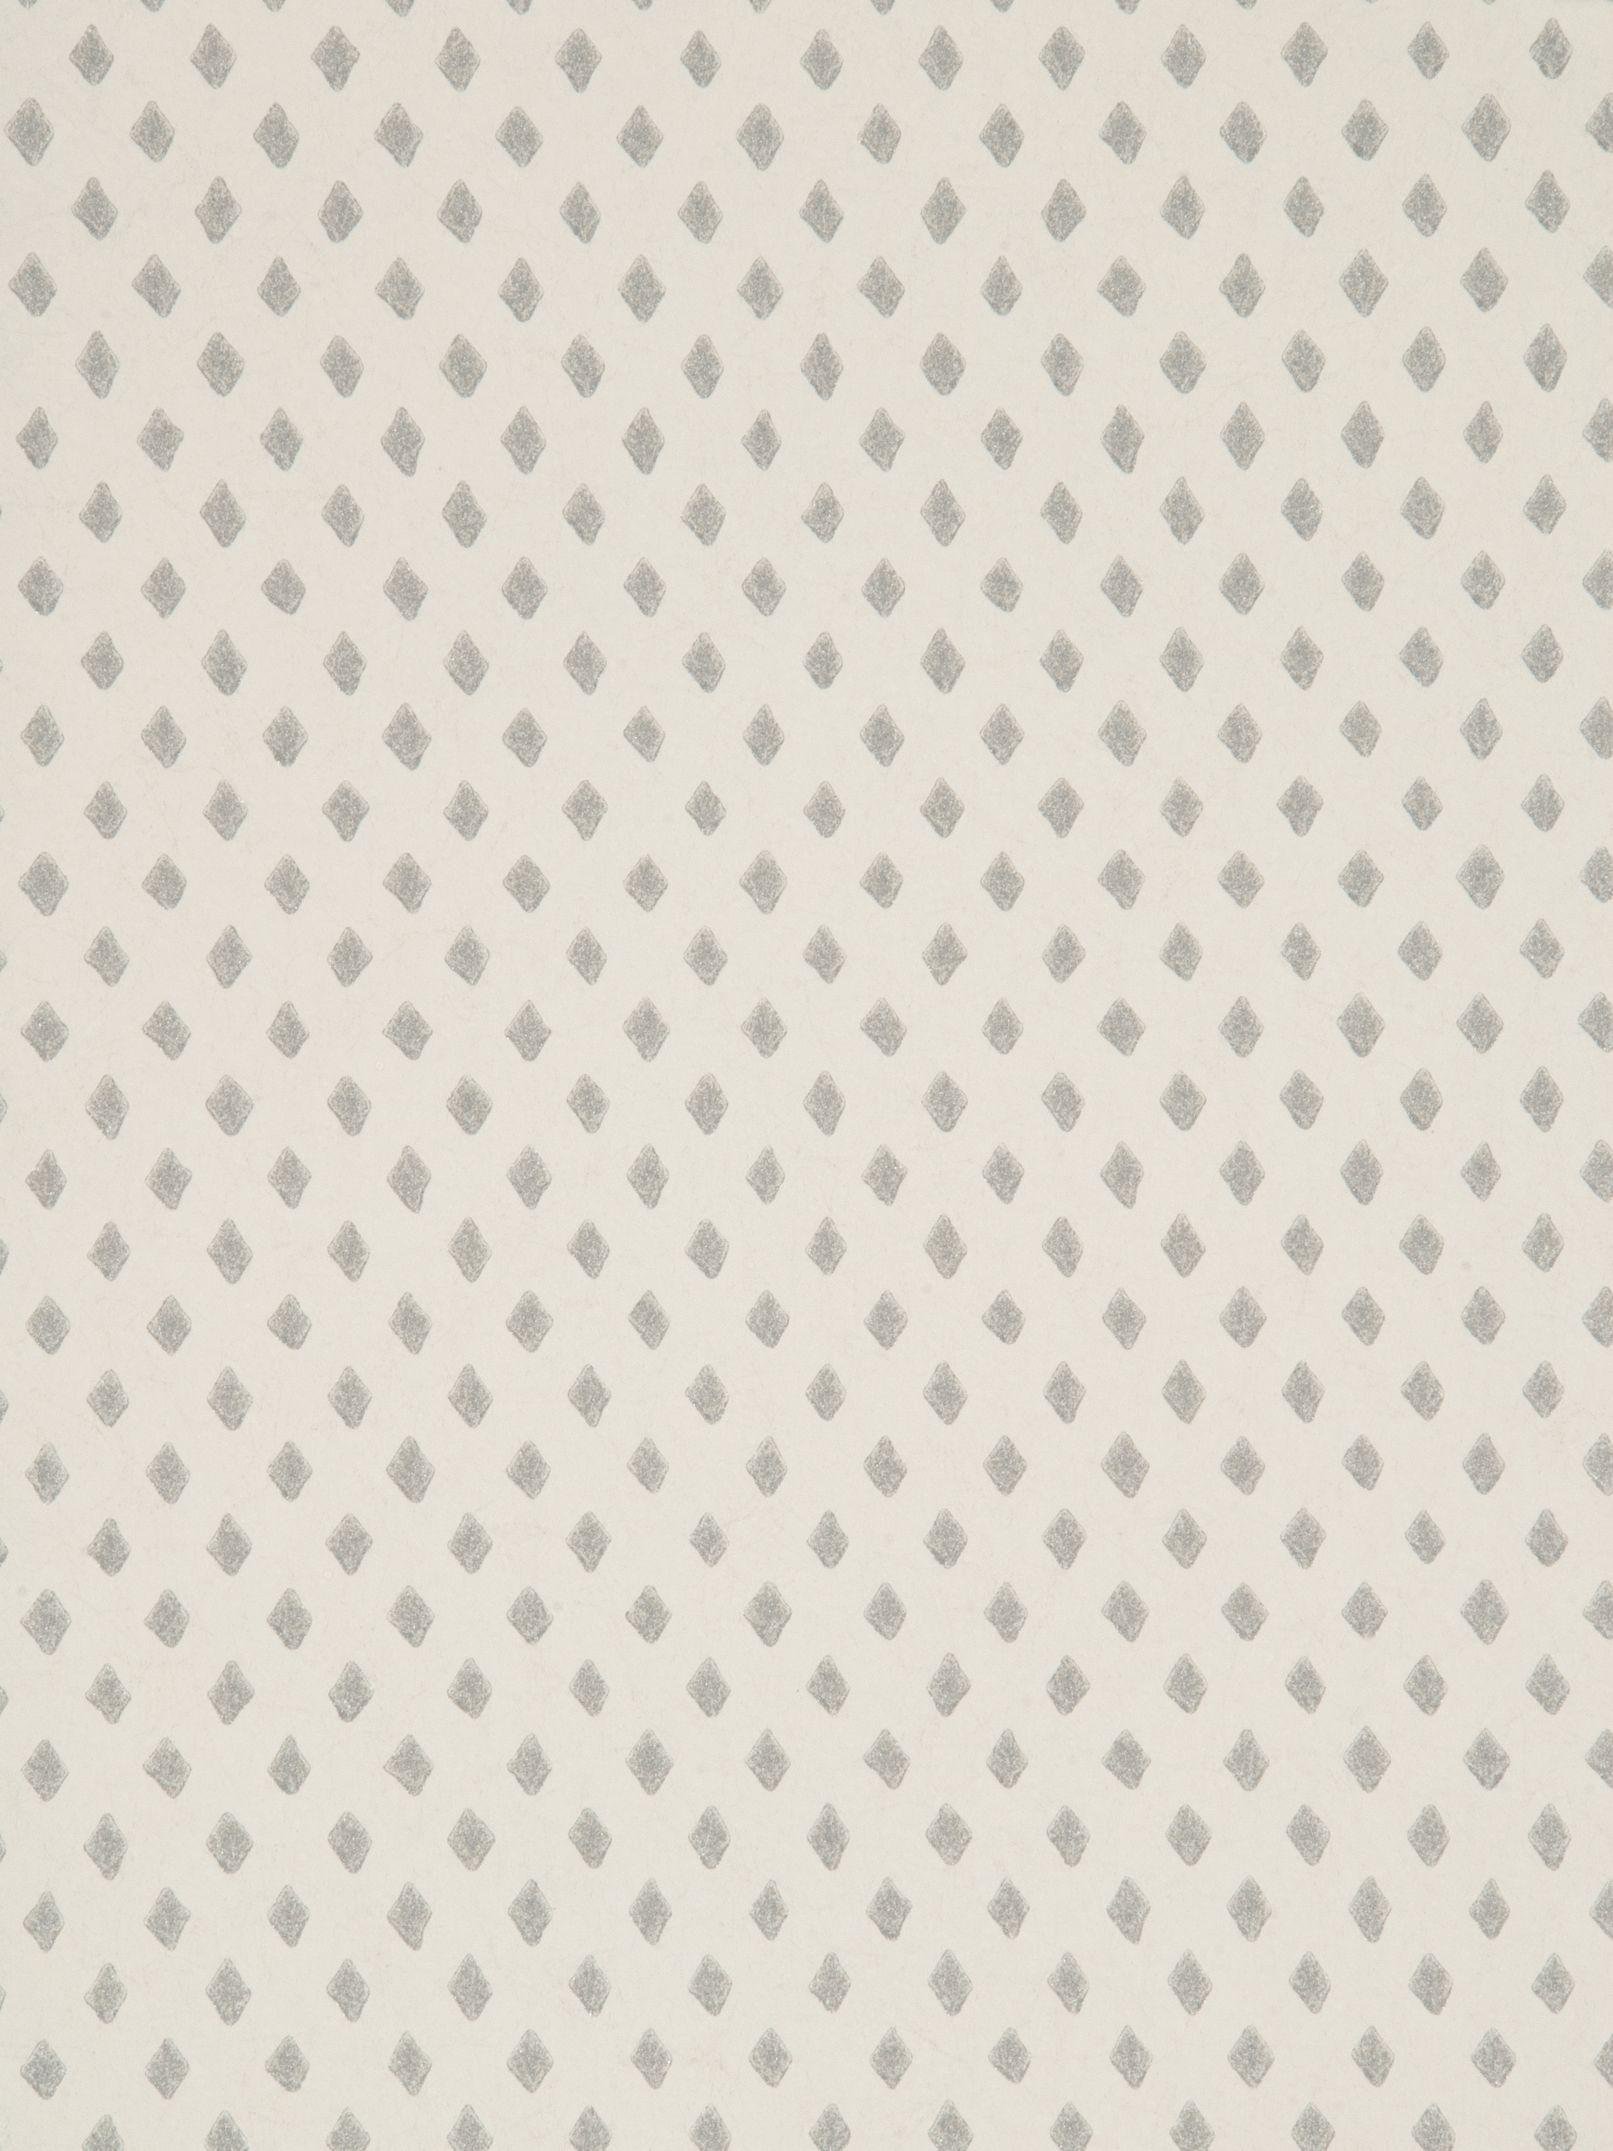 GP & J Baker GP & J Baker Blyth Effects Paste the Wall Wallpaper